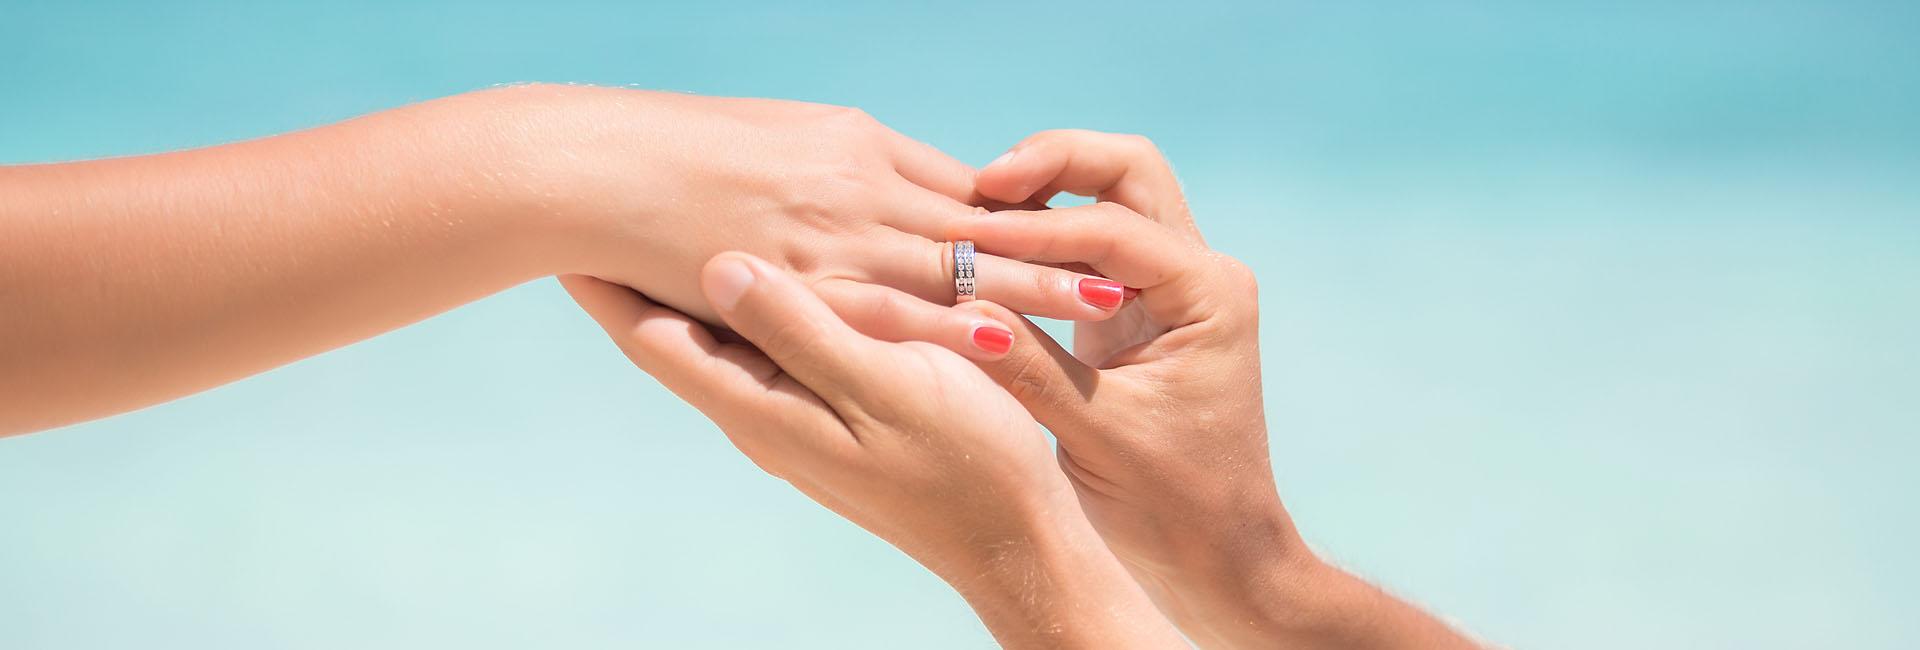 0 most romantic places in puerto vallarta to propose